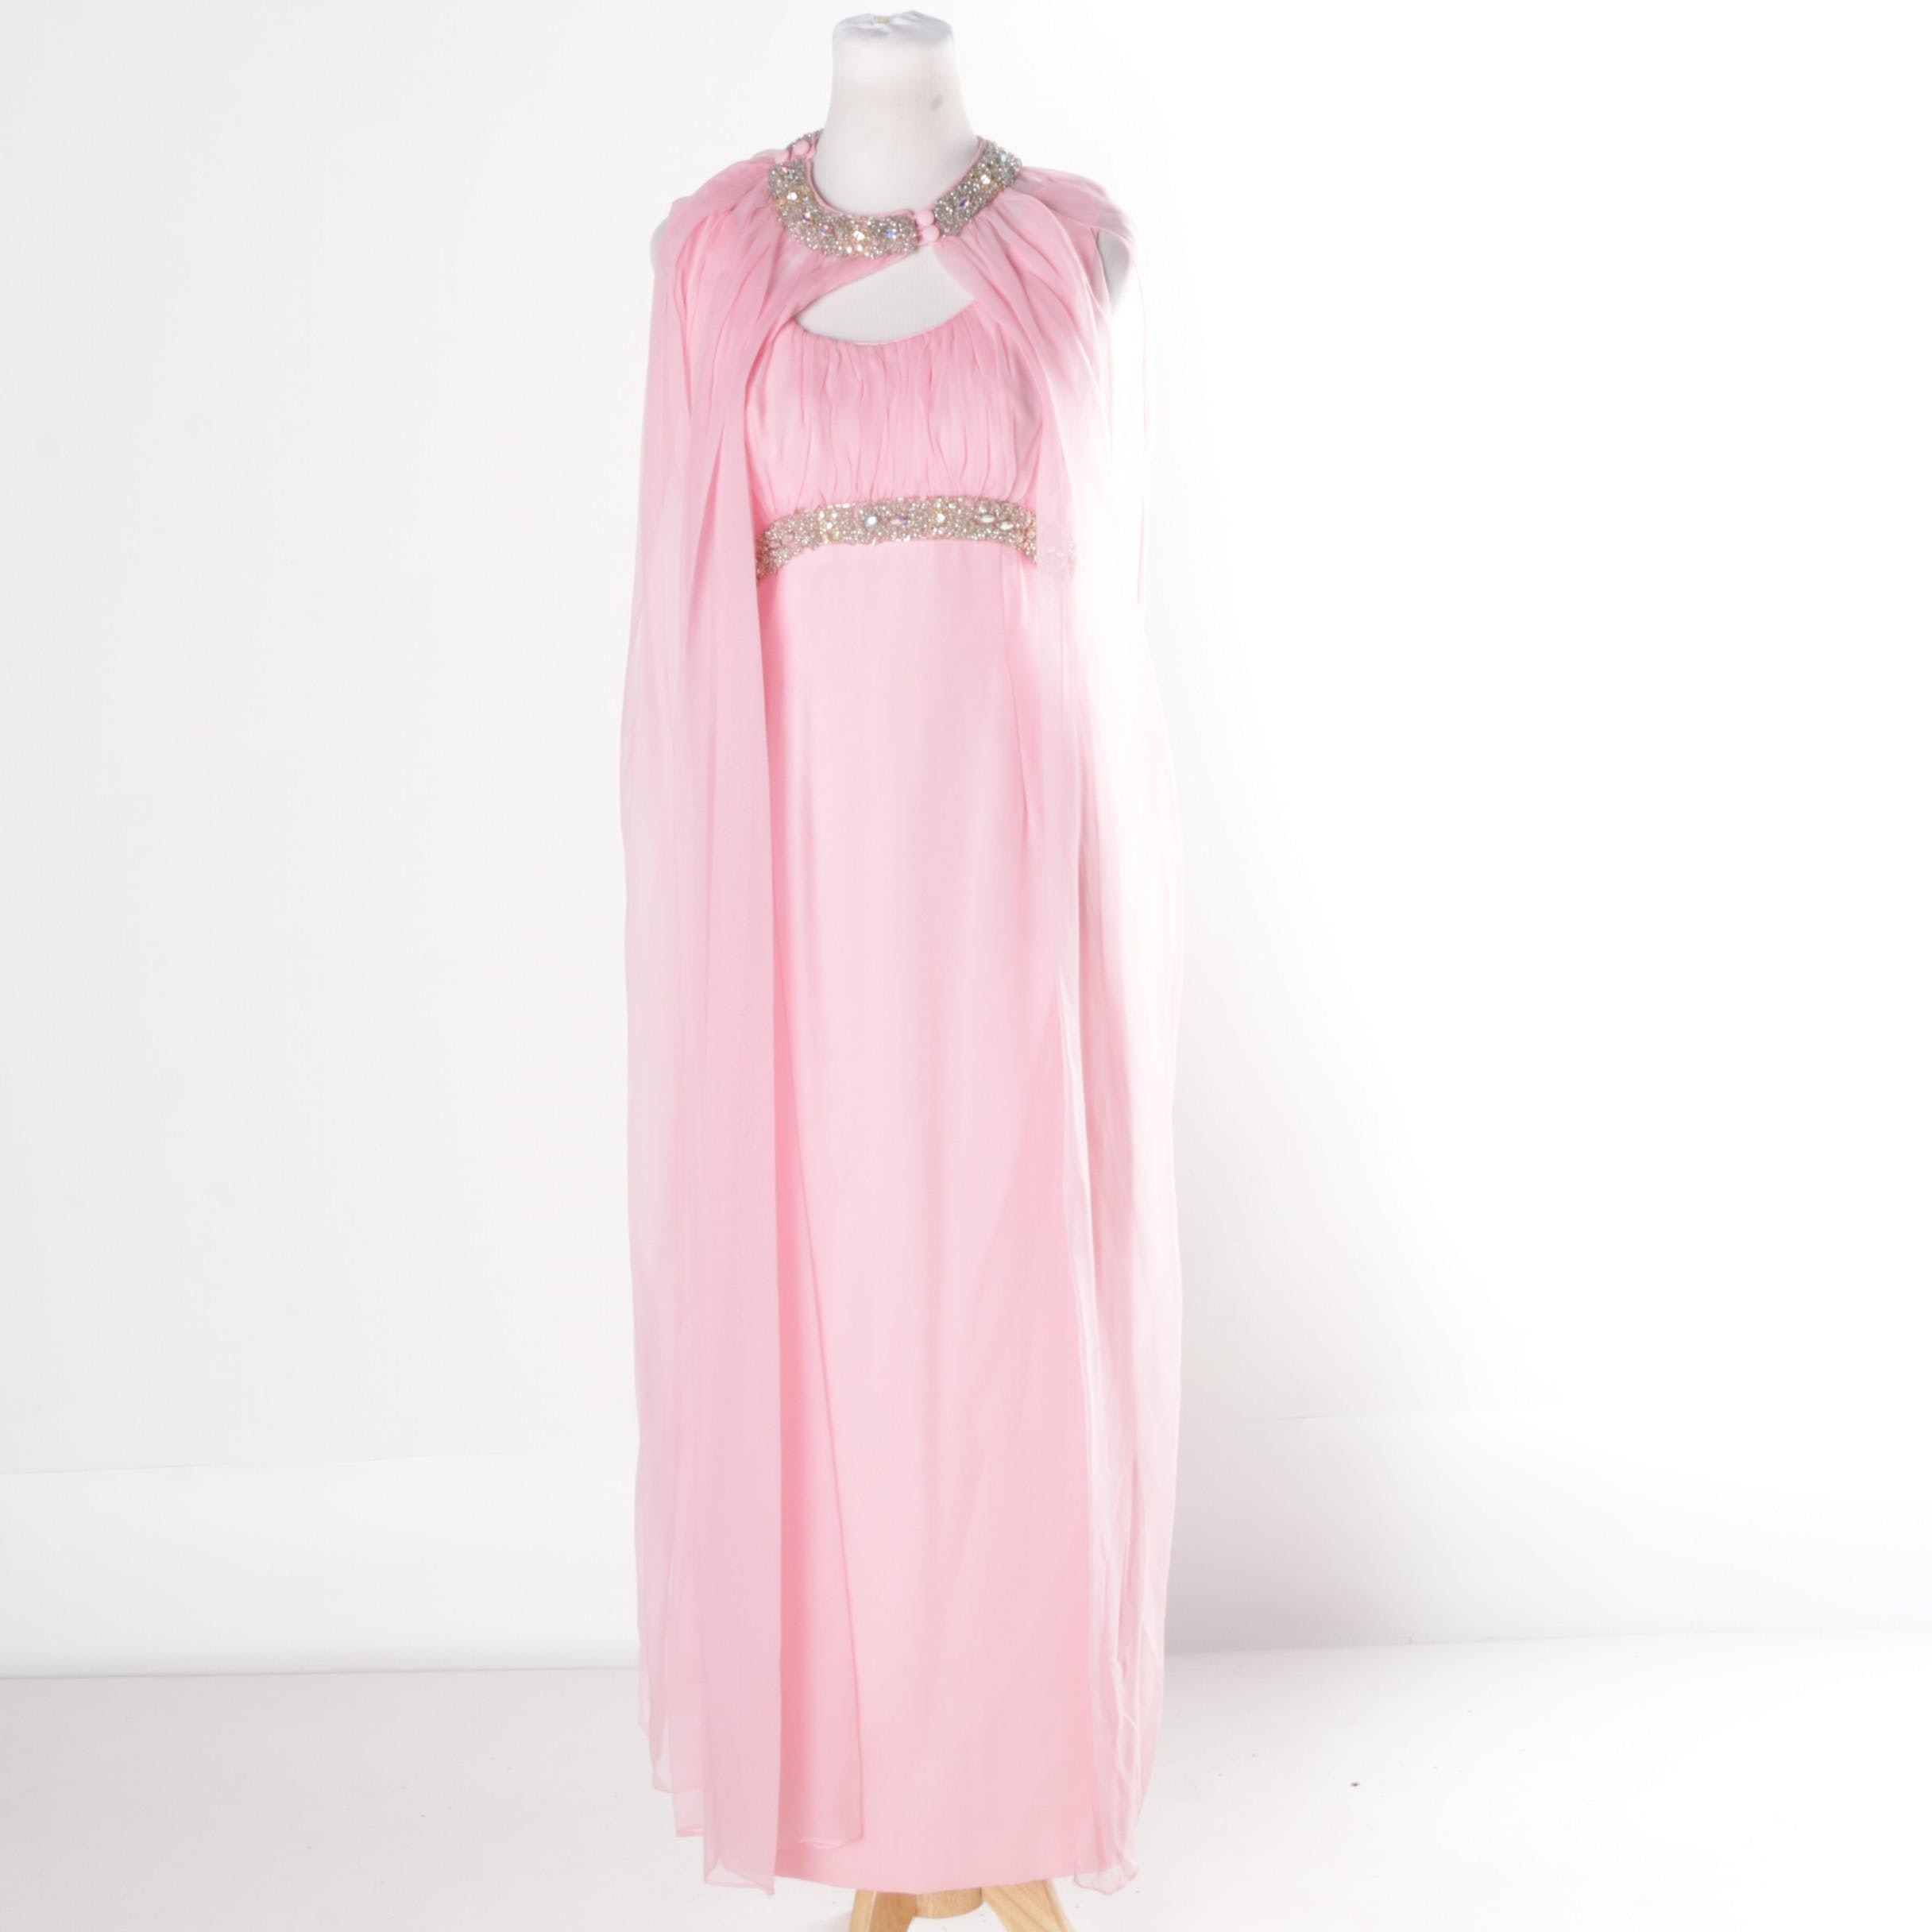 Circa 1960s Vintage Pink Chiffon and Taffeta Evening Dress and Cape Ensemble